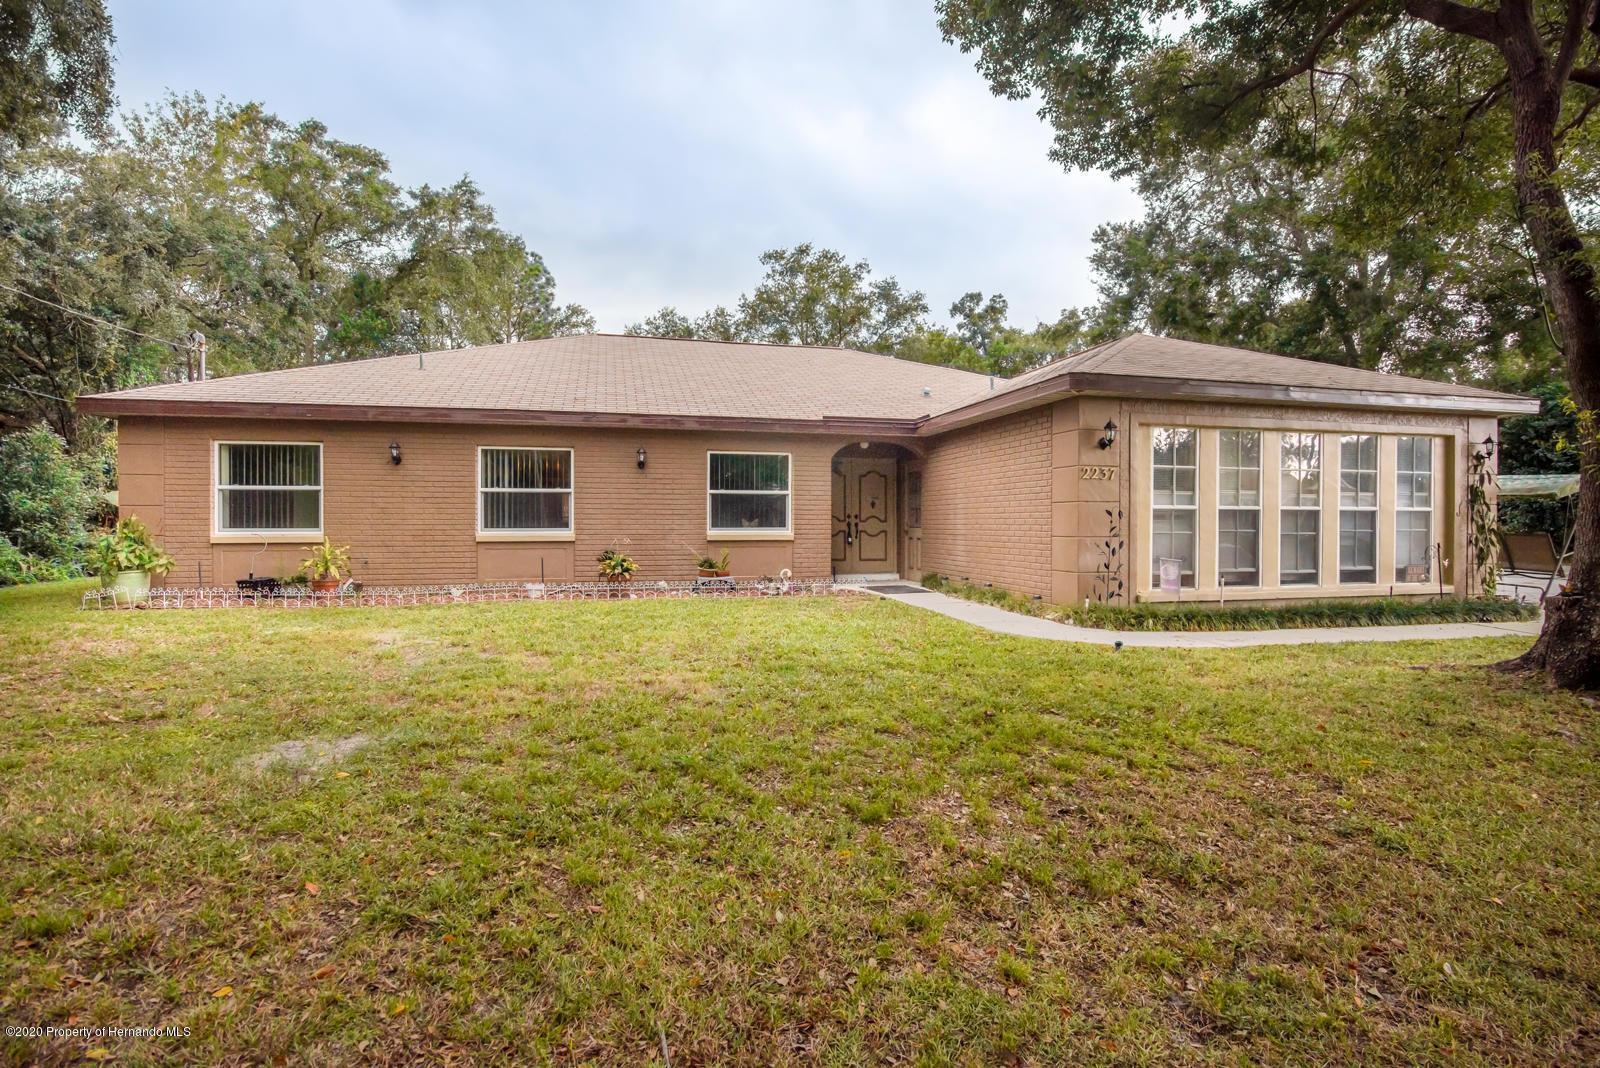 Details for 2237 Laredo Avenue, Spring Hill, FL 34608